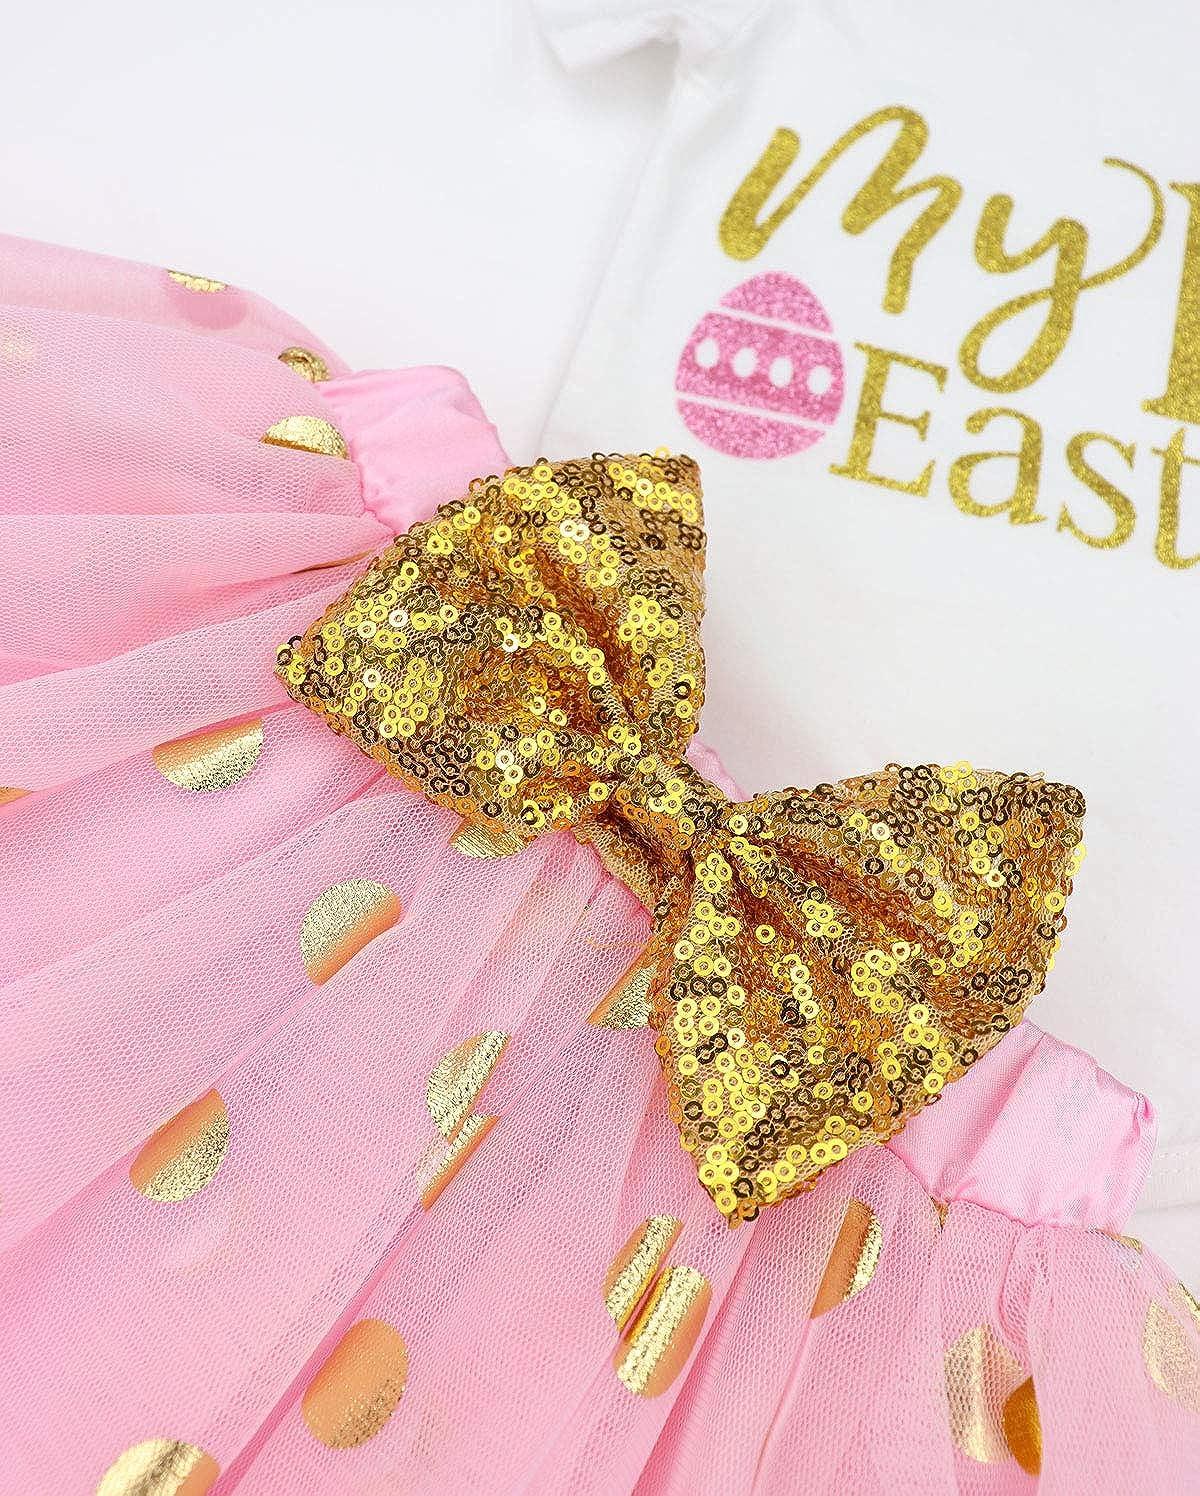 Uaena Baby Girls My 1st Easter Tutu Romper Dress Short Bodysuit Headband Outfit for 3 6 9 12 Months Uaena-0075